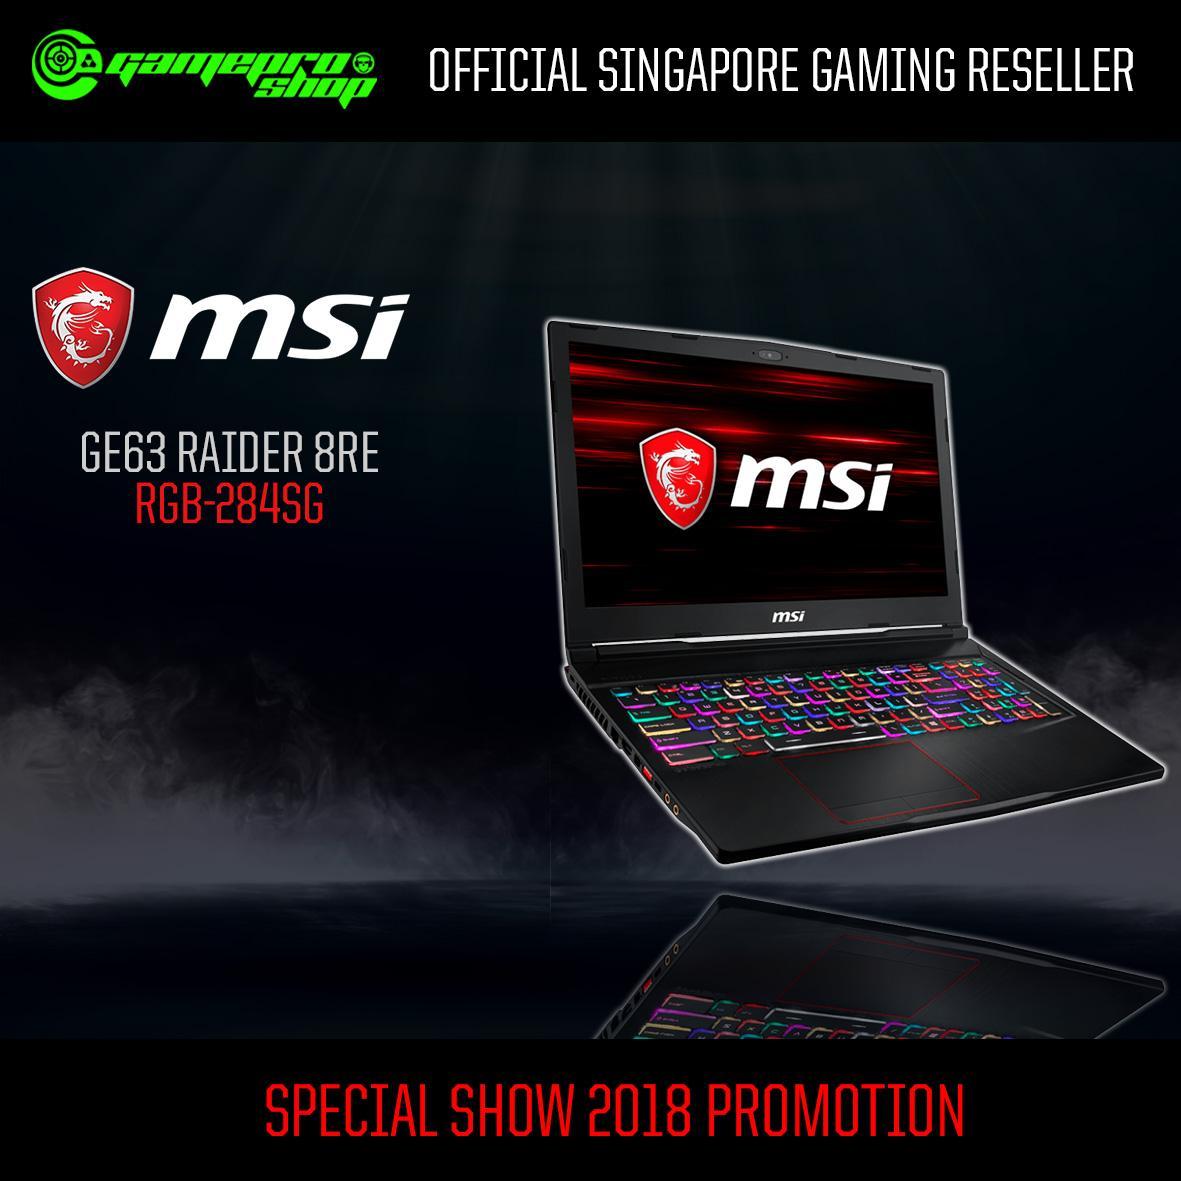 MSI GE63 Raider 8RE RGB-284SG (I7-8750H/16GB DDR4/256GB SSD+1TB HDD 7200RPM/6GB NVIDIA GTX1060 GDDR5/15.6FHD 120Hz/W10)